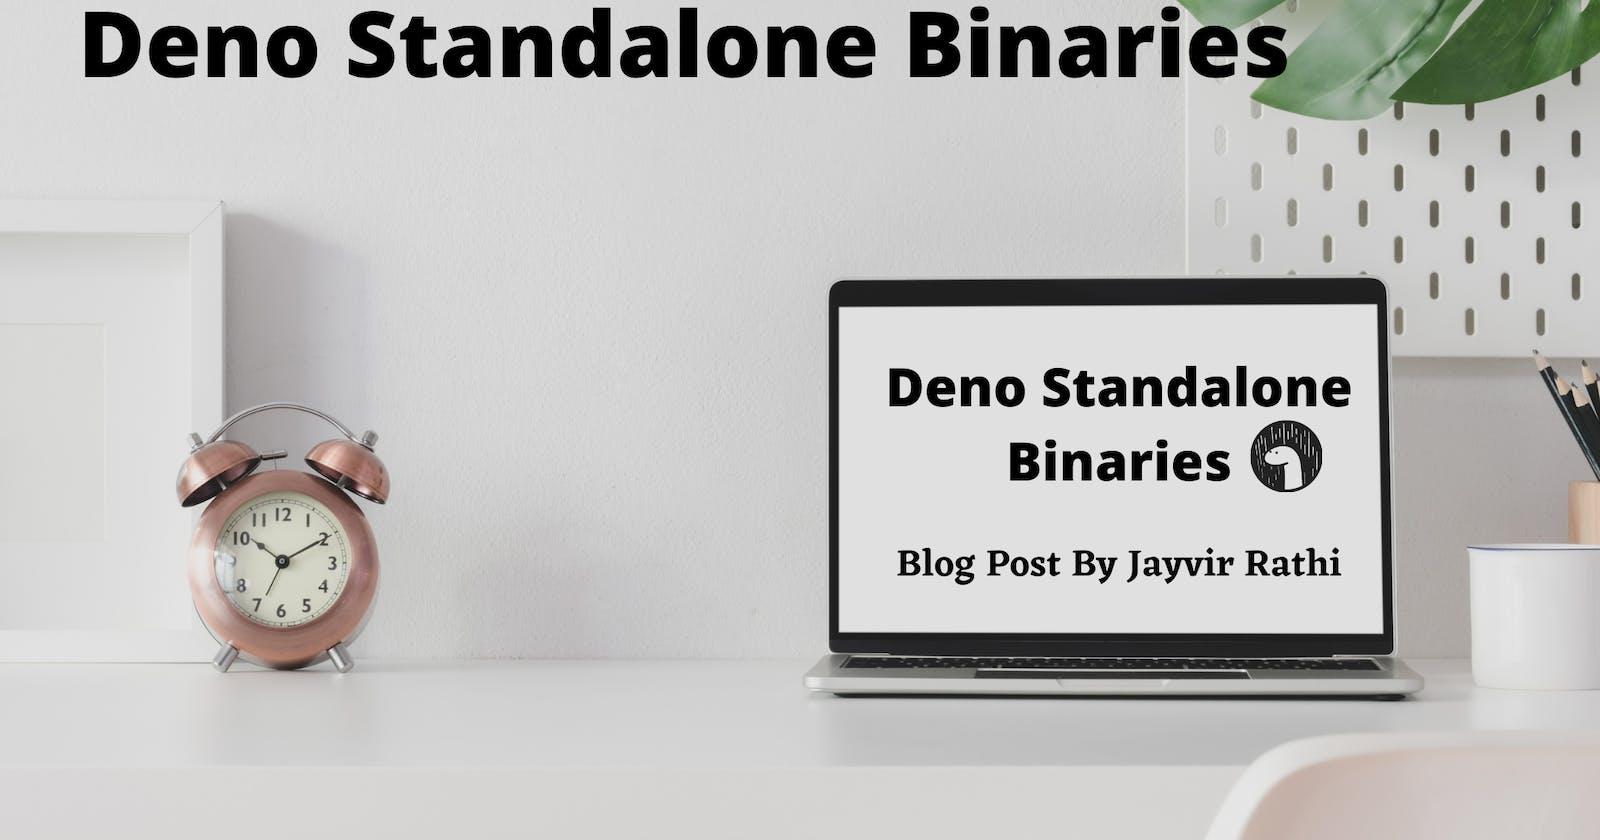 Deno Standalone Binaries